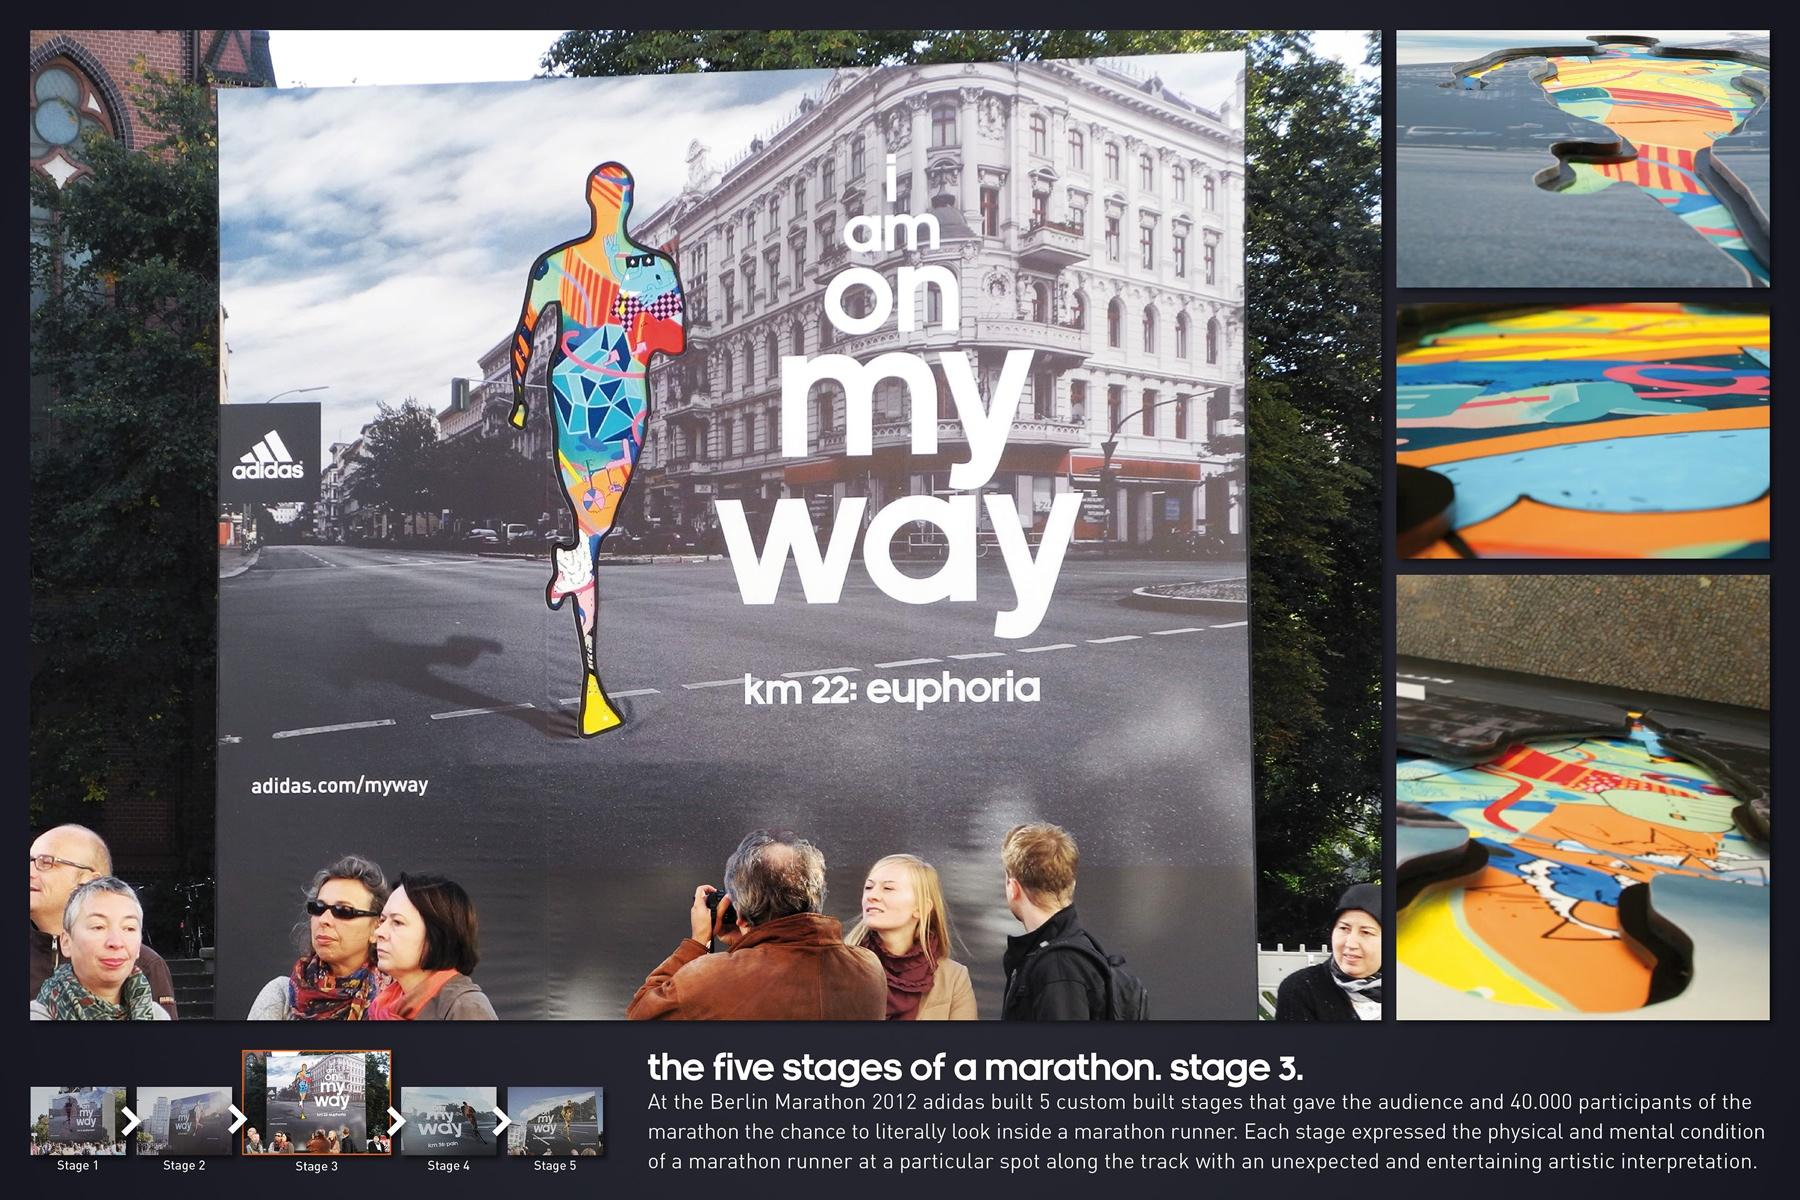 Berlin Marathon Outdoor Ad -  The Five Stages of a Marathon, Euphoria